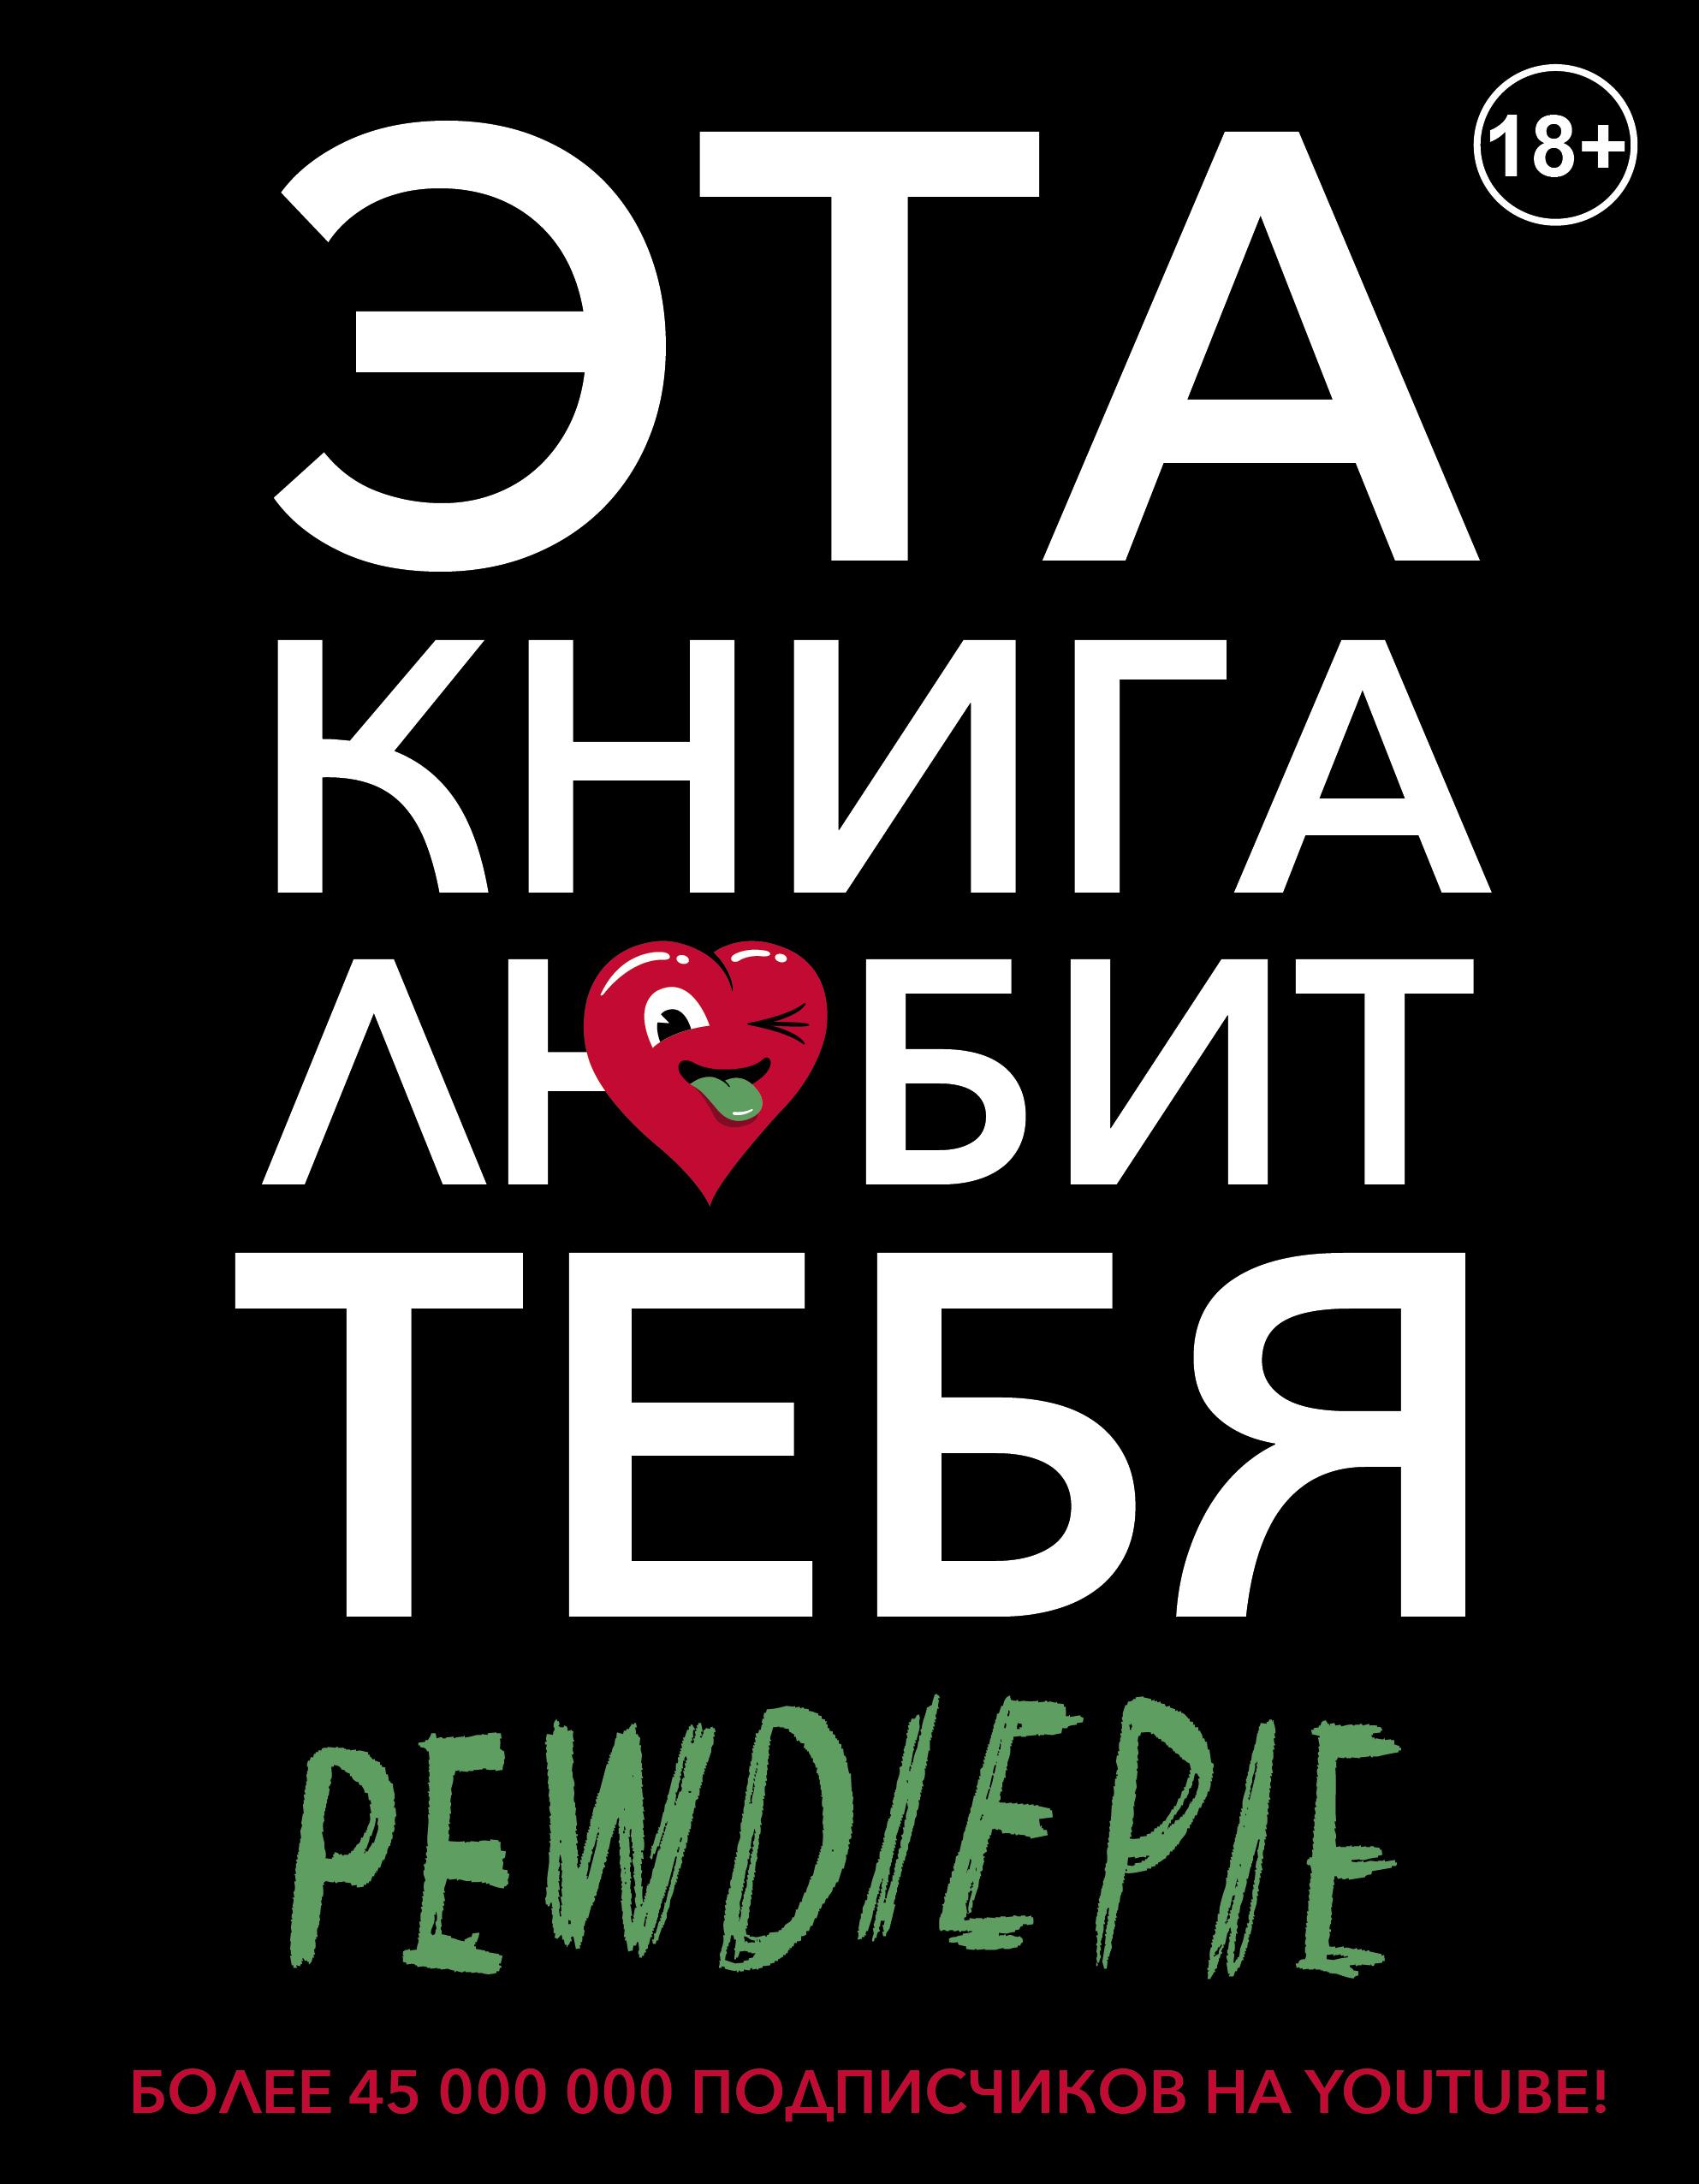 PewDiePie (Чельберг Ф.) PewDiePie. Эта книга любит тебя